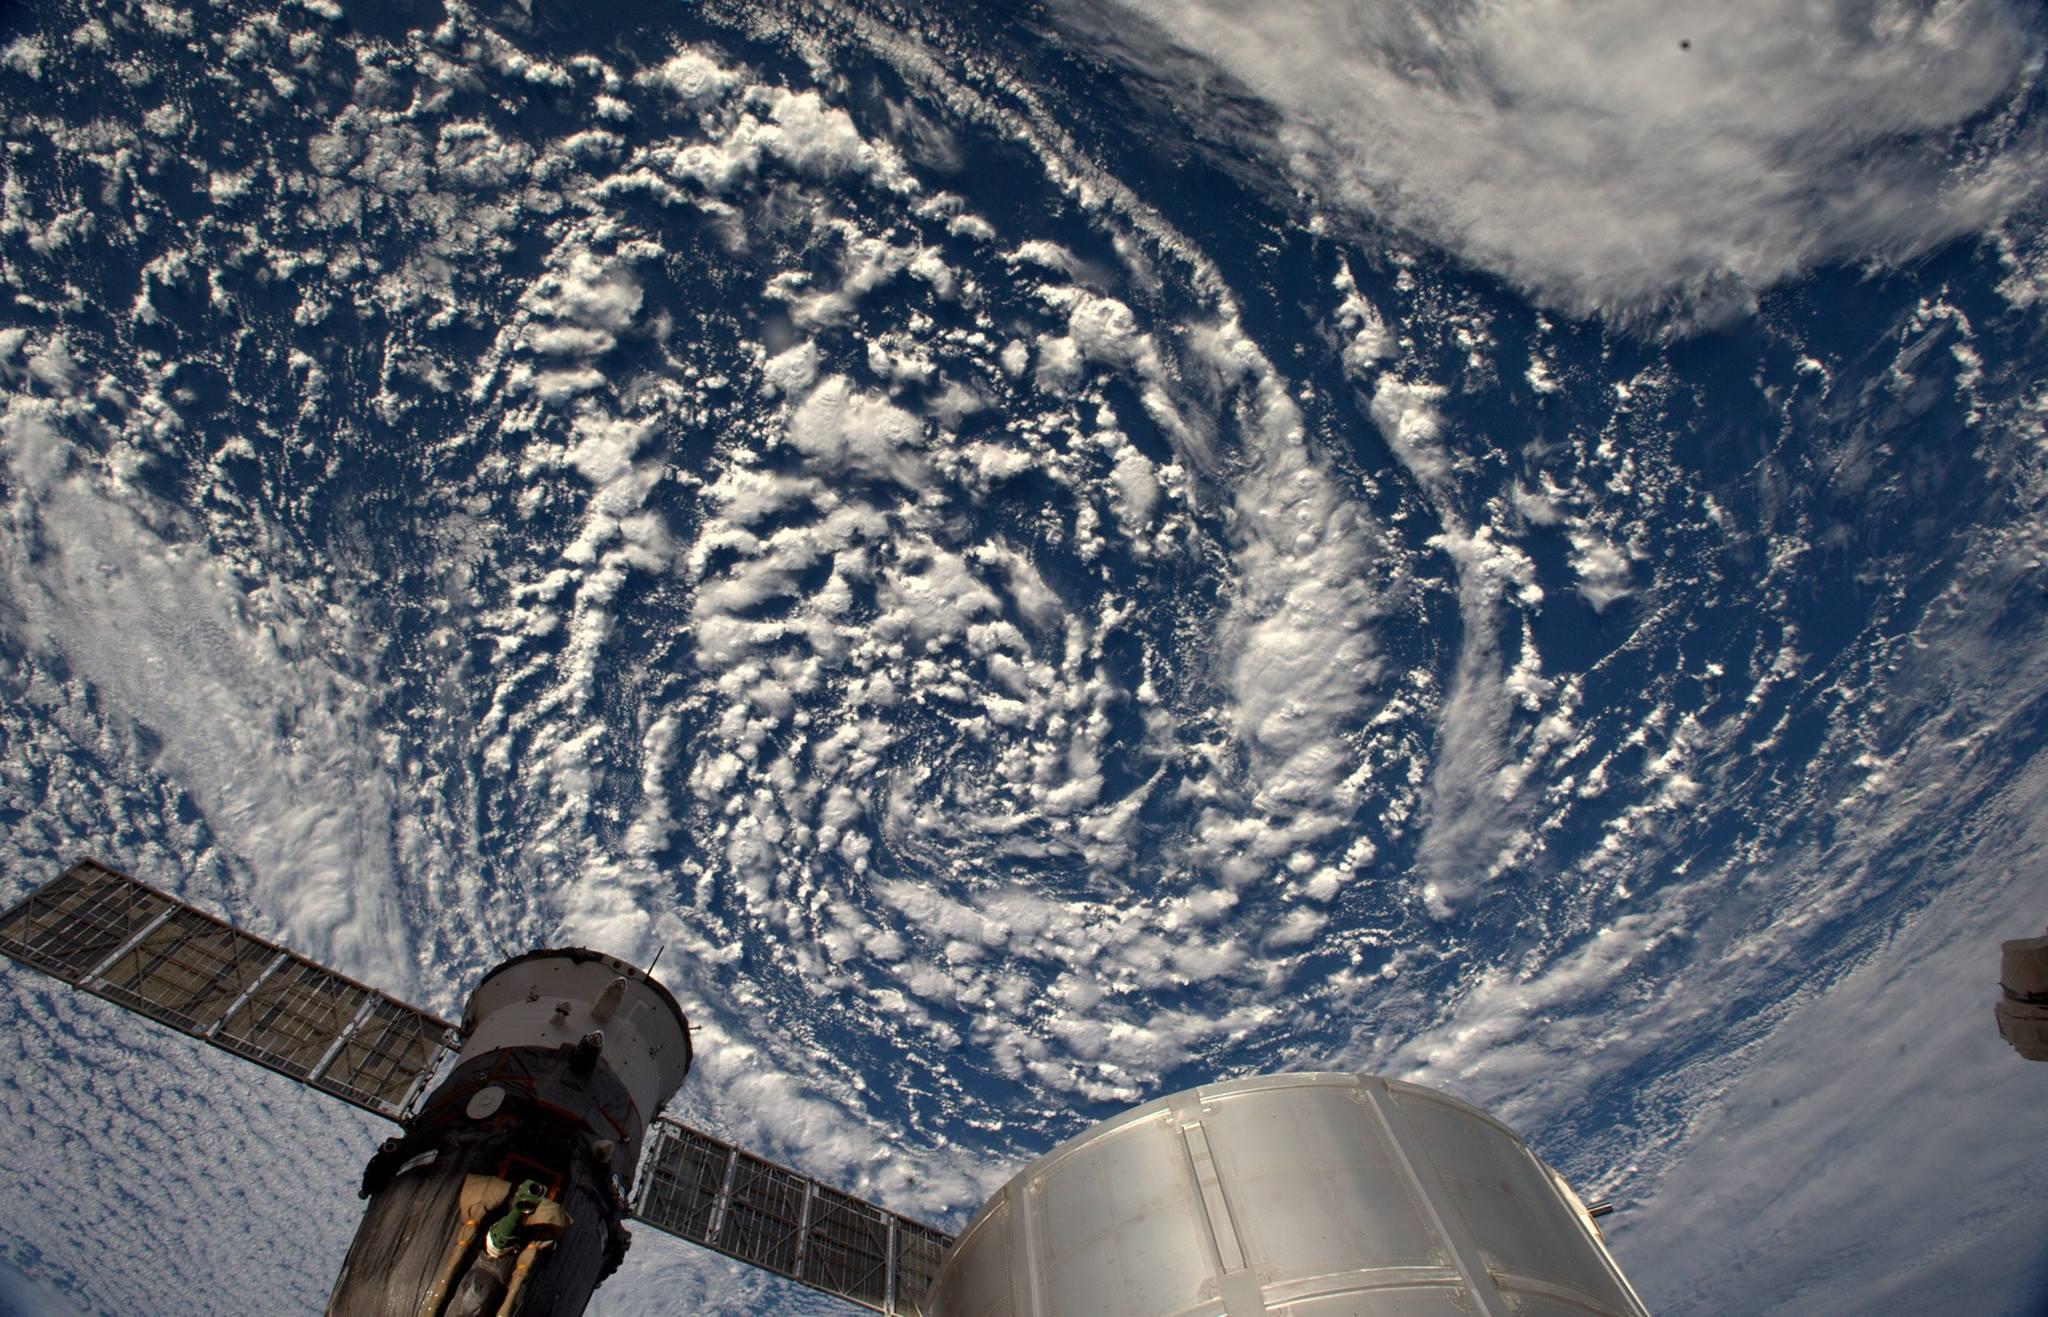 Photos astronaut Alexander Gerst 28